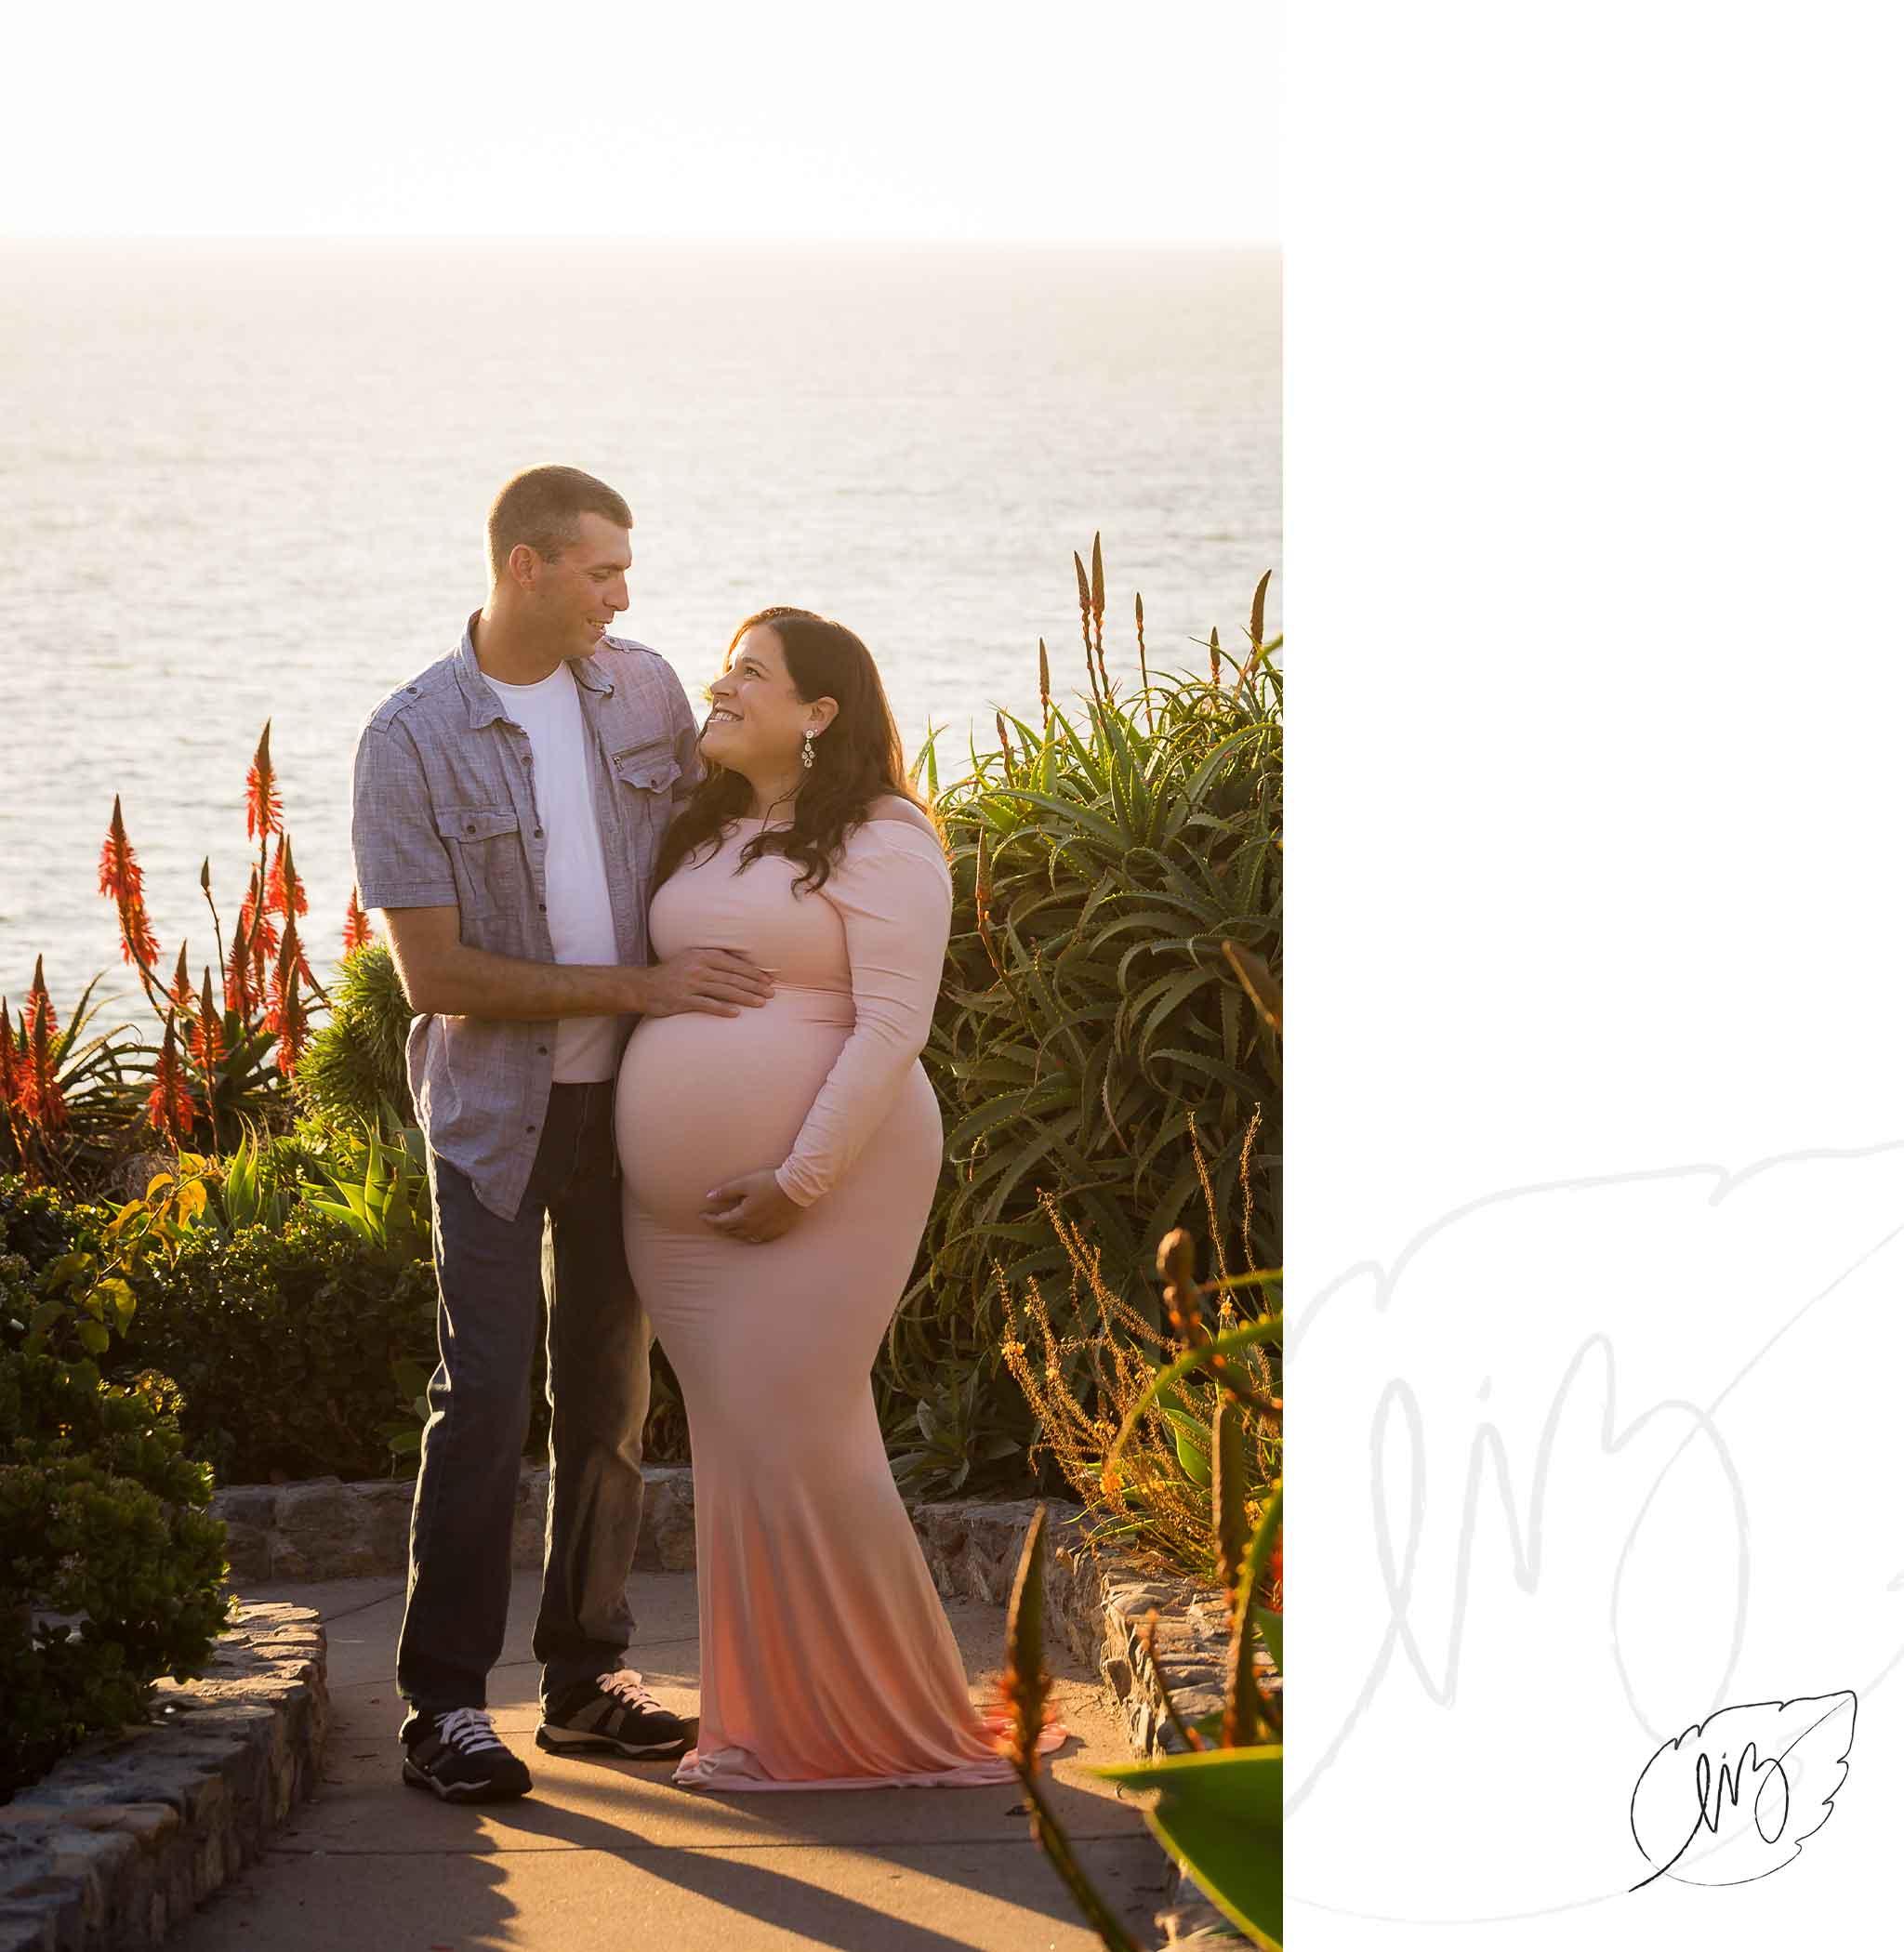 California_Inland_Empire_Maternity_Photographer_01.jpg